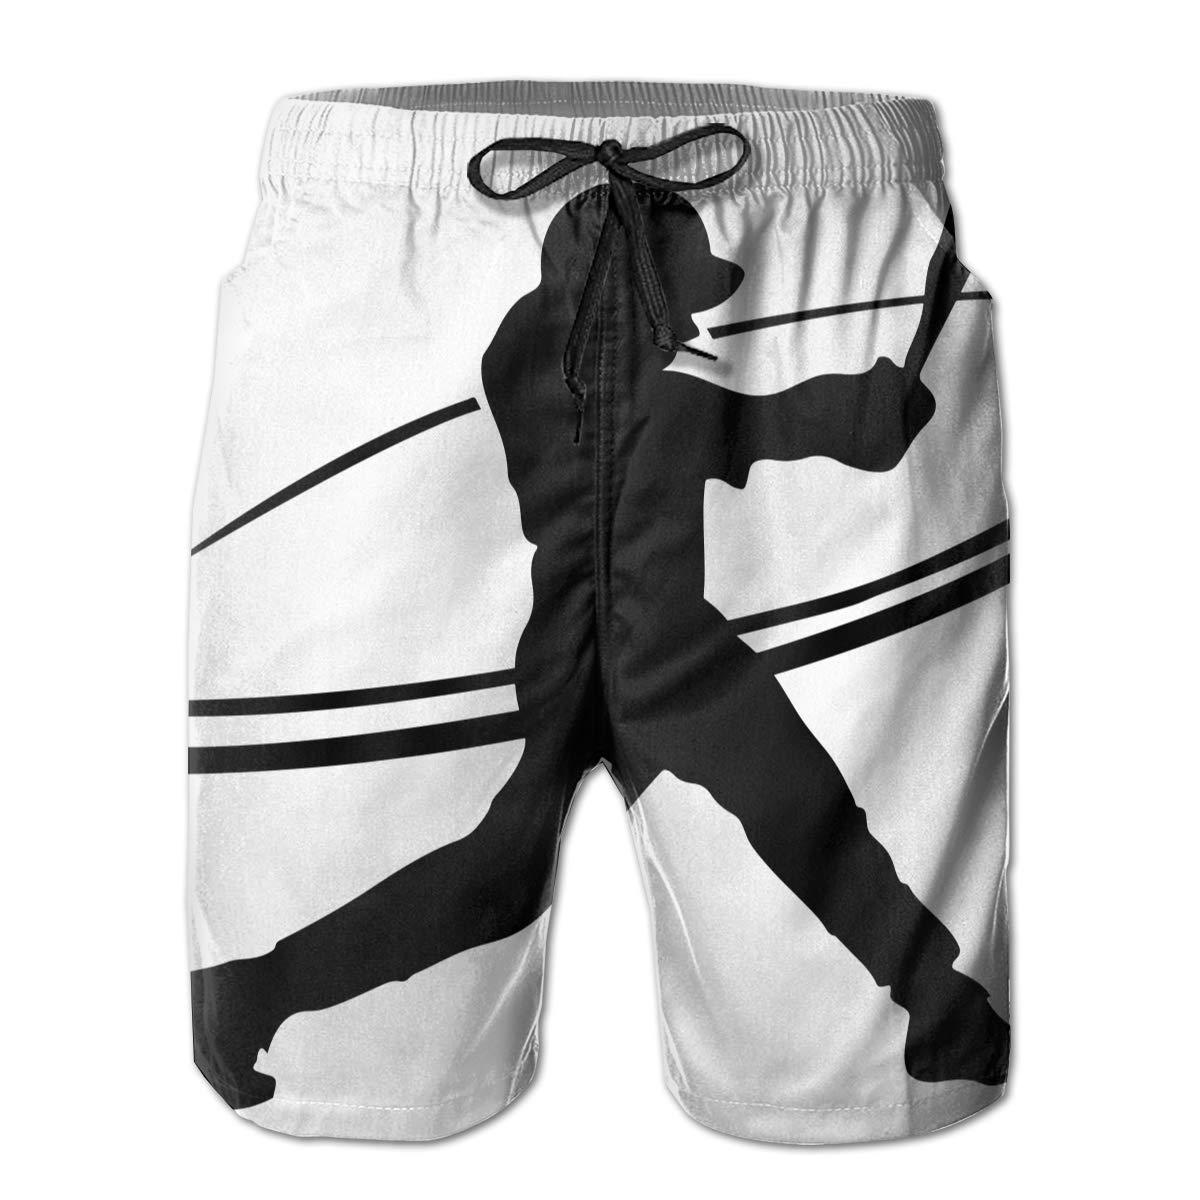 HZamora/_H Mens Softball Silhouette Summer Breathable Quick-Drying Swim Trunks Beach Shorts Cargo Shorts